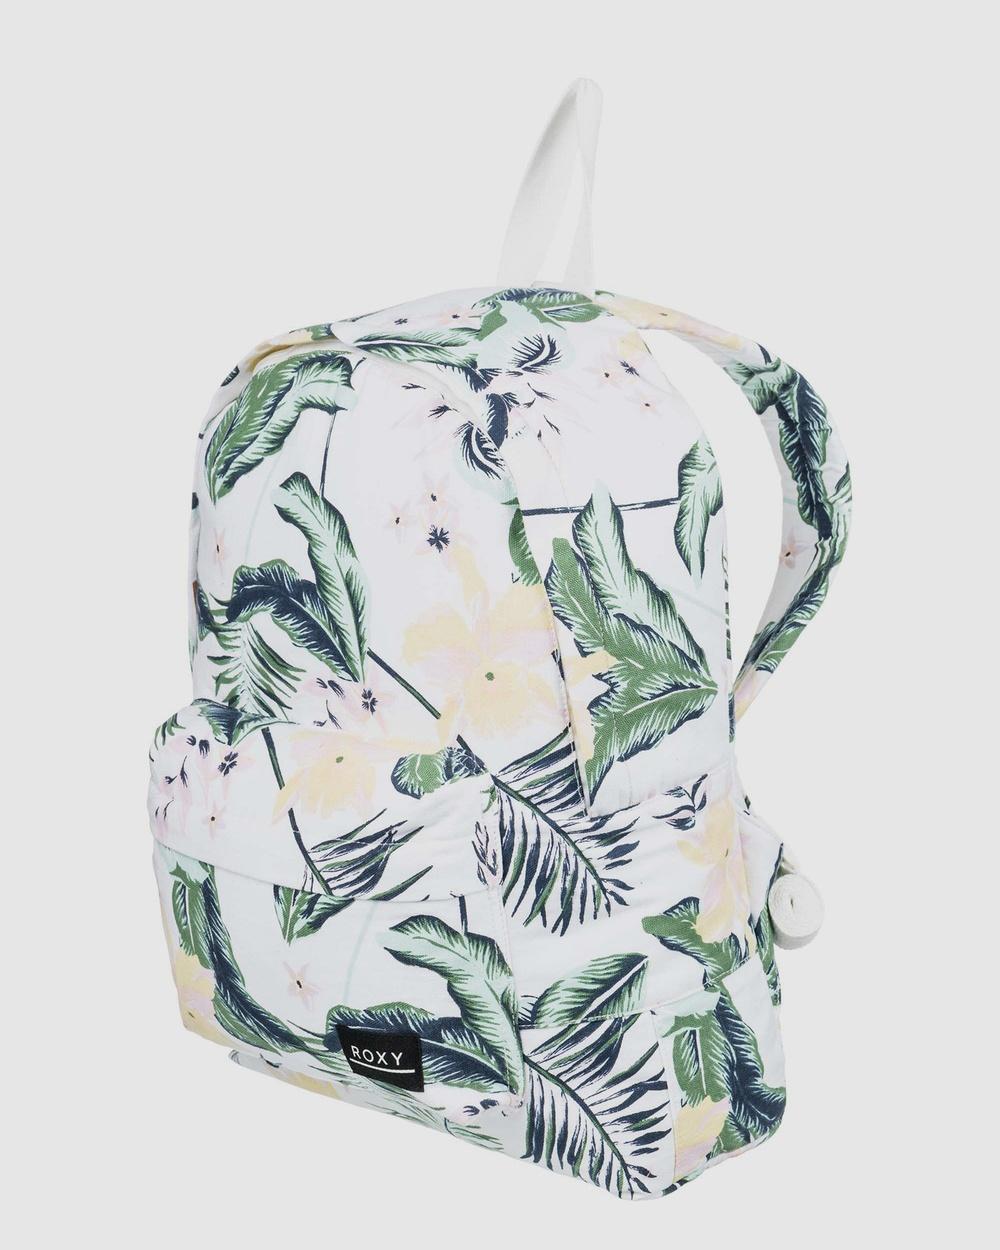 Roxy Sugar Baby 16L Small Backpack Backpacks BRIGHT WHITE PRASLIN